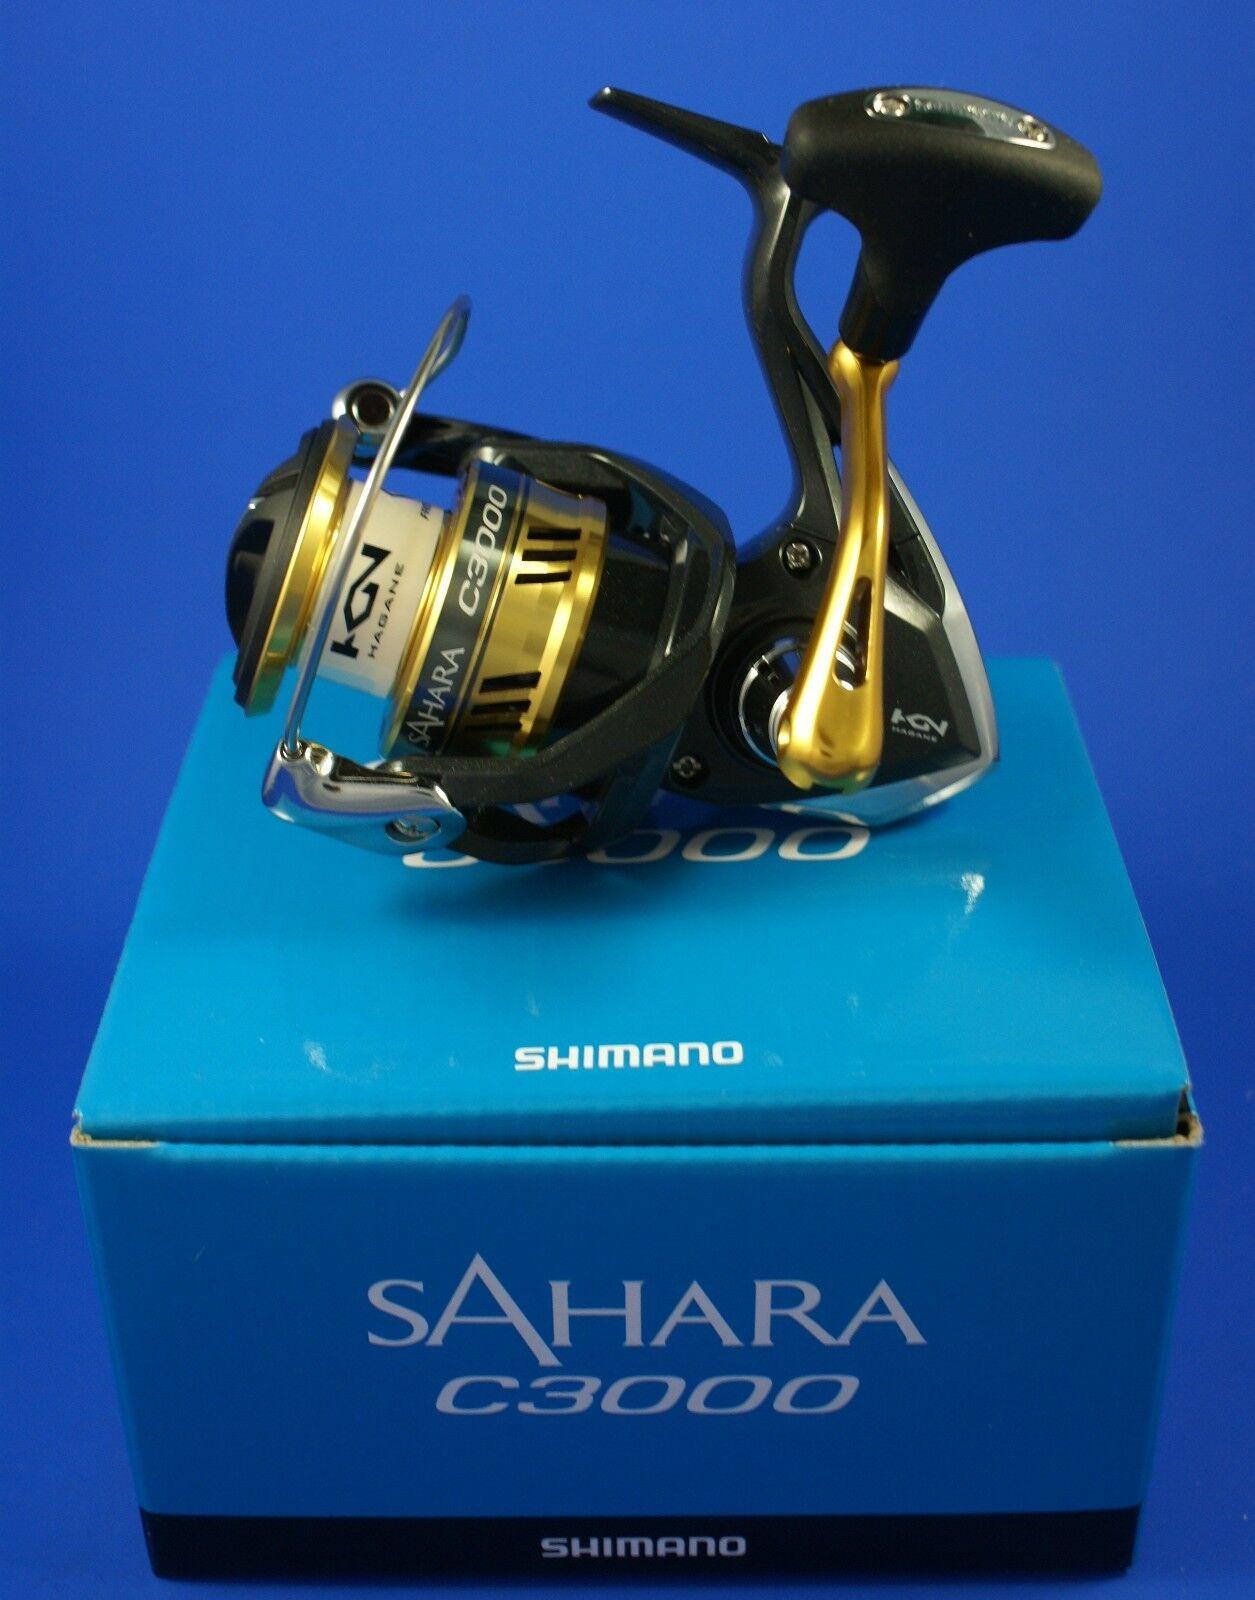 Shimano SAHARA C3000 FI  SHC3000FI  mulinello da pesca trascinamento frontale